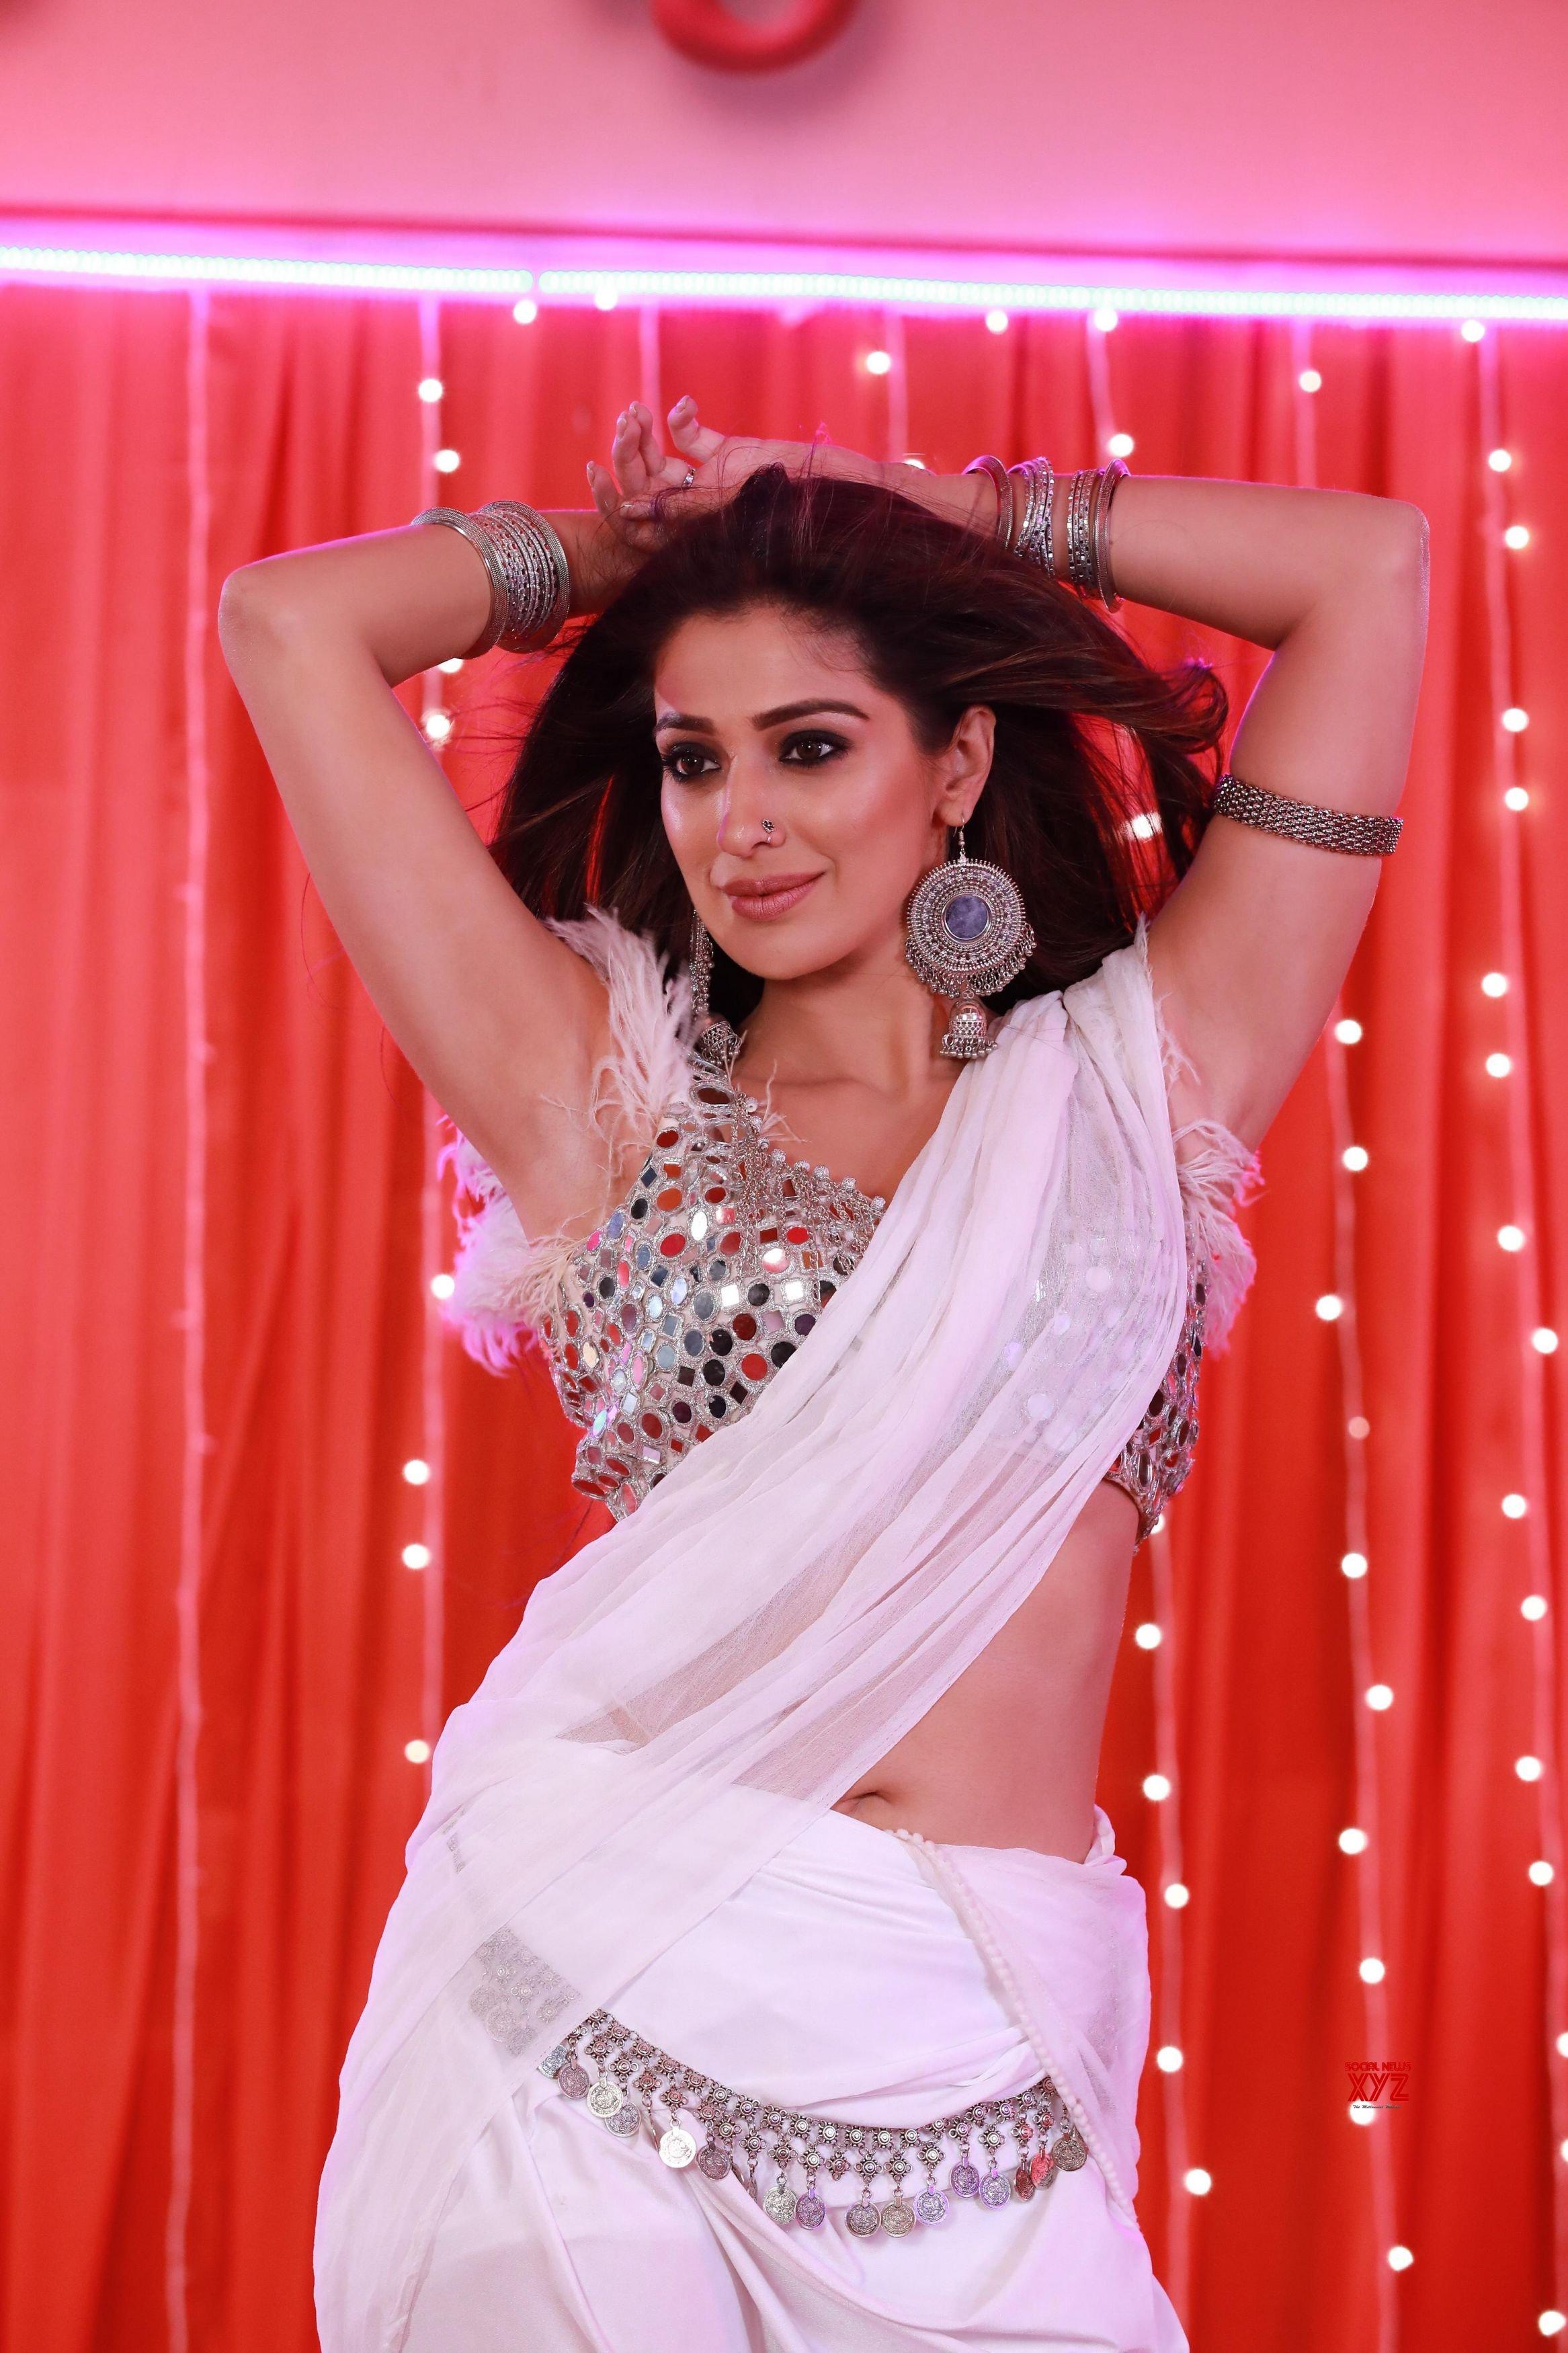 Actress Lakshmi Manchu Glamorous Photoshoot Stills | New